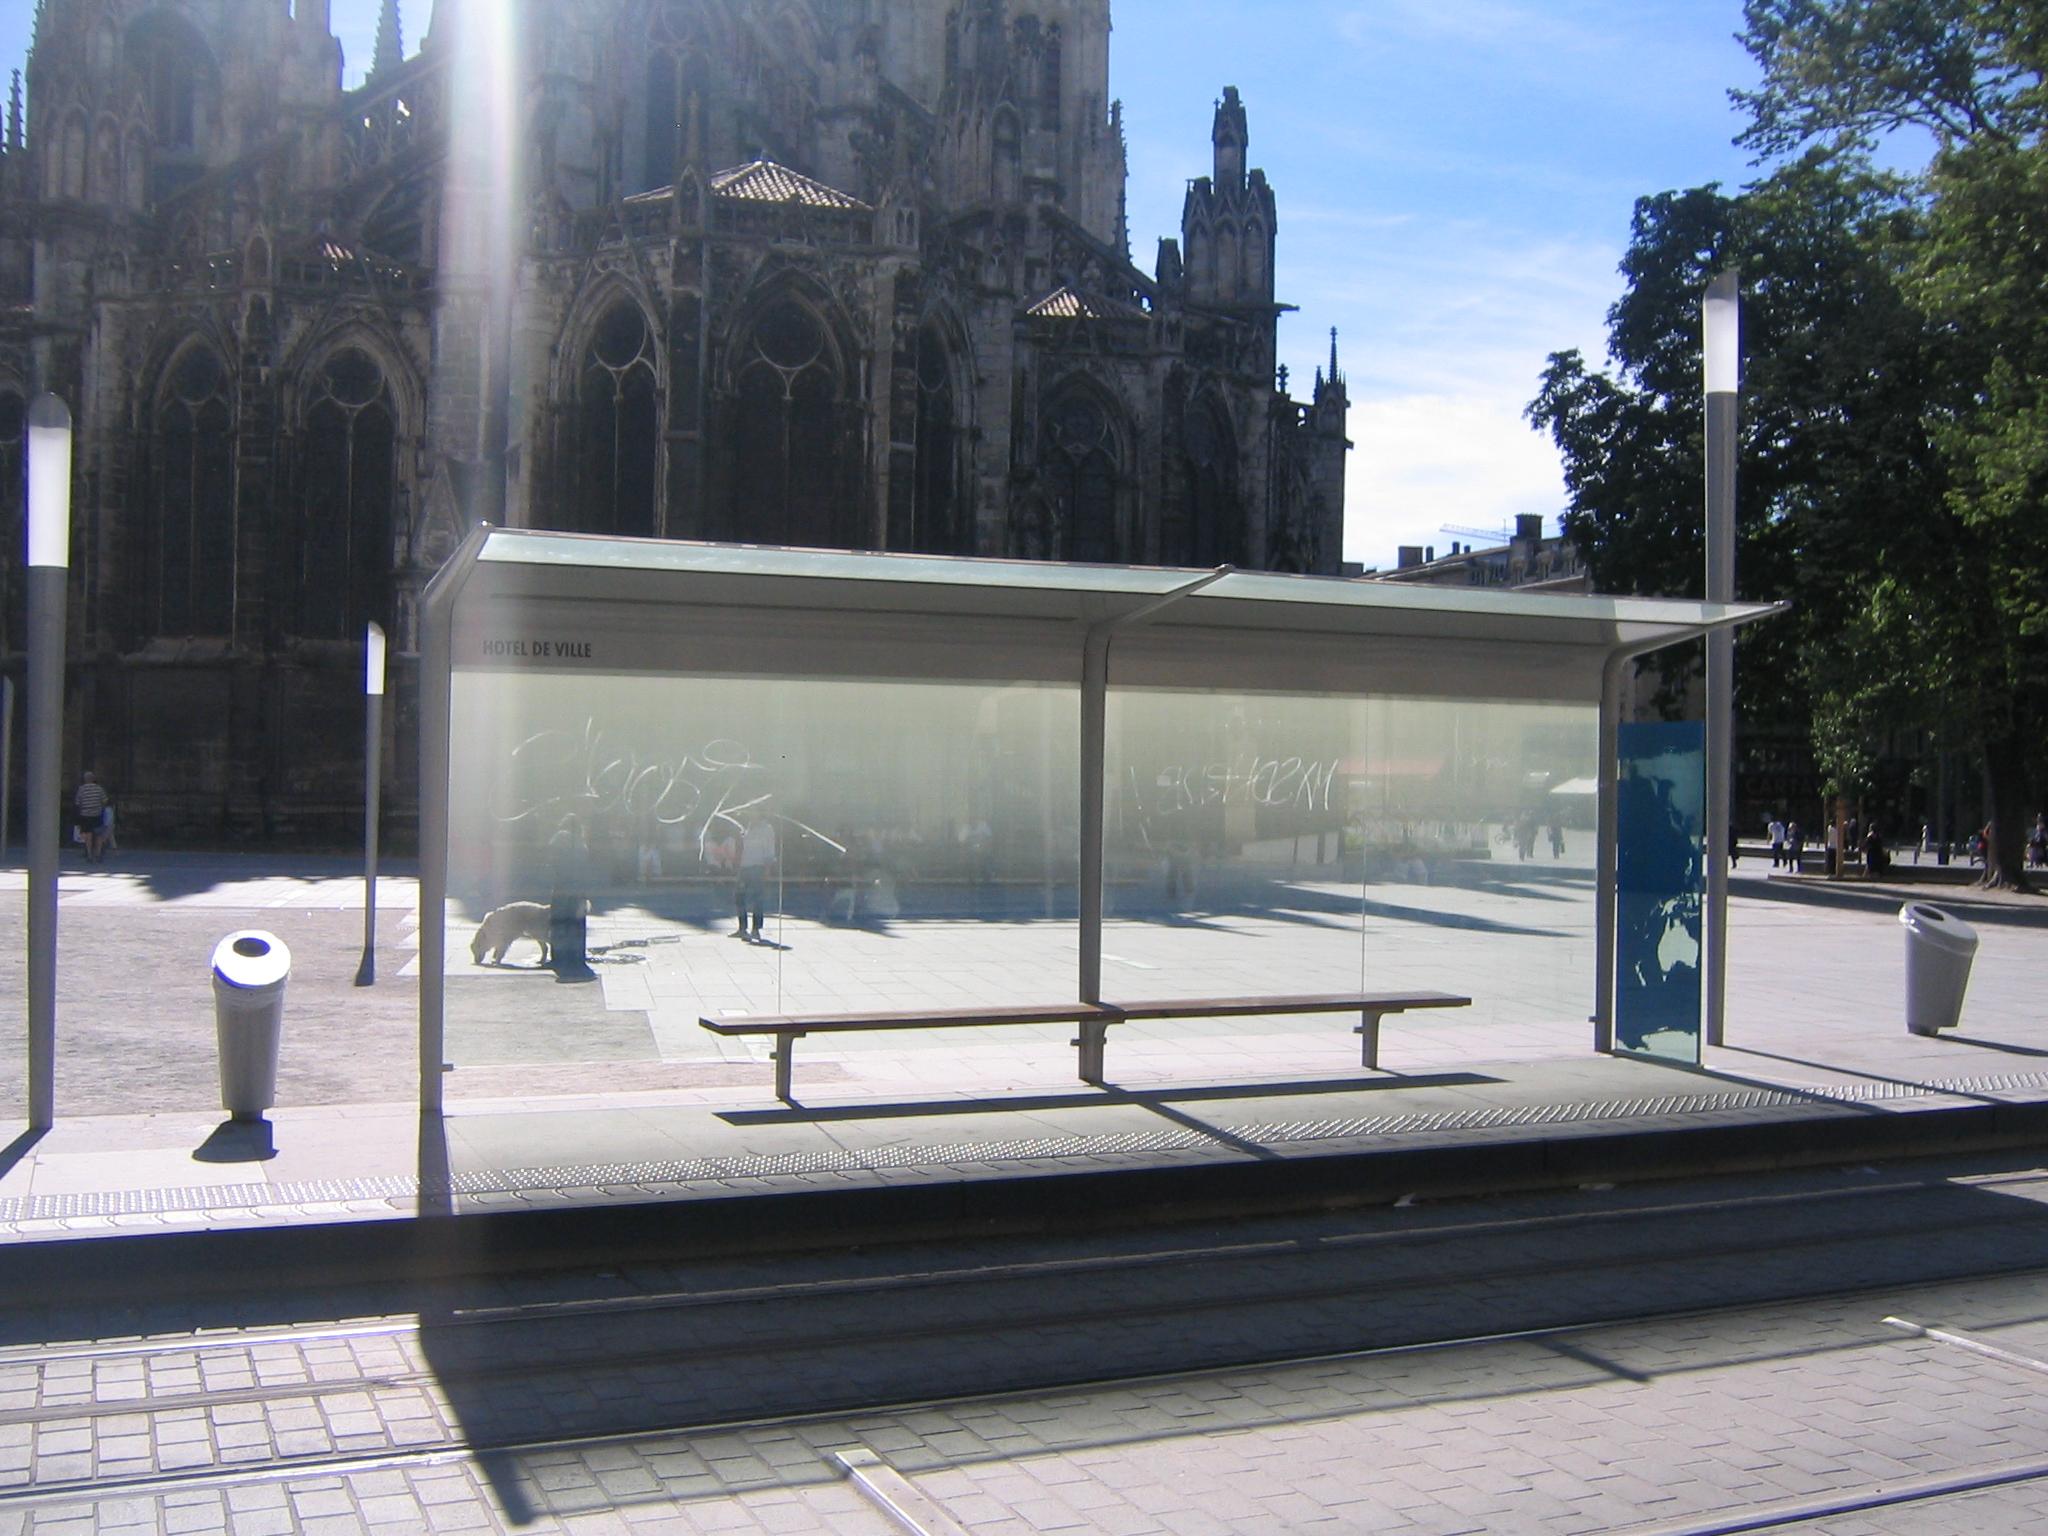 file arret de tram bordeaux h tel de wikimedia commons. Black Bedroom Furniture Sets. Home Design Ideas